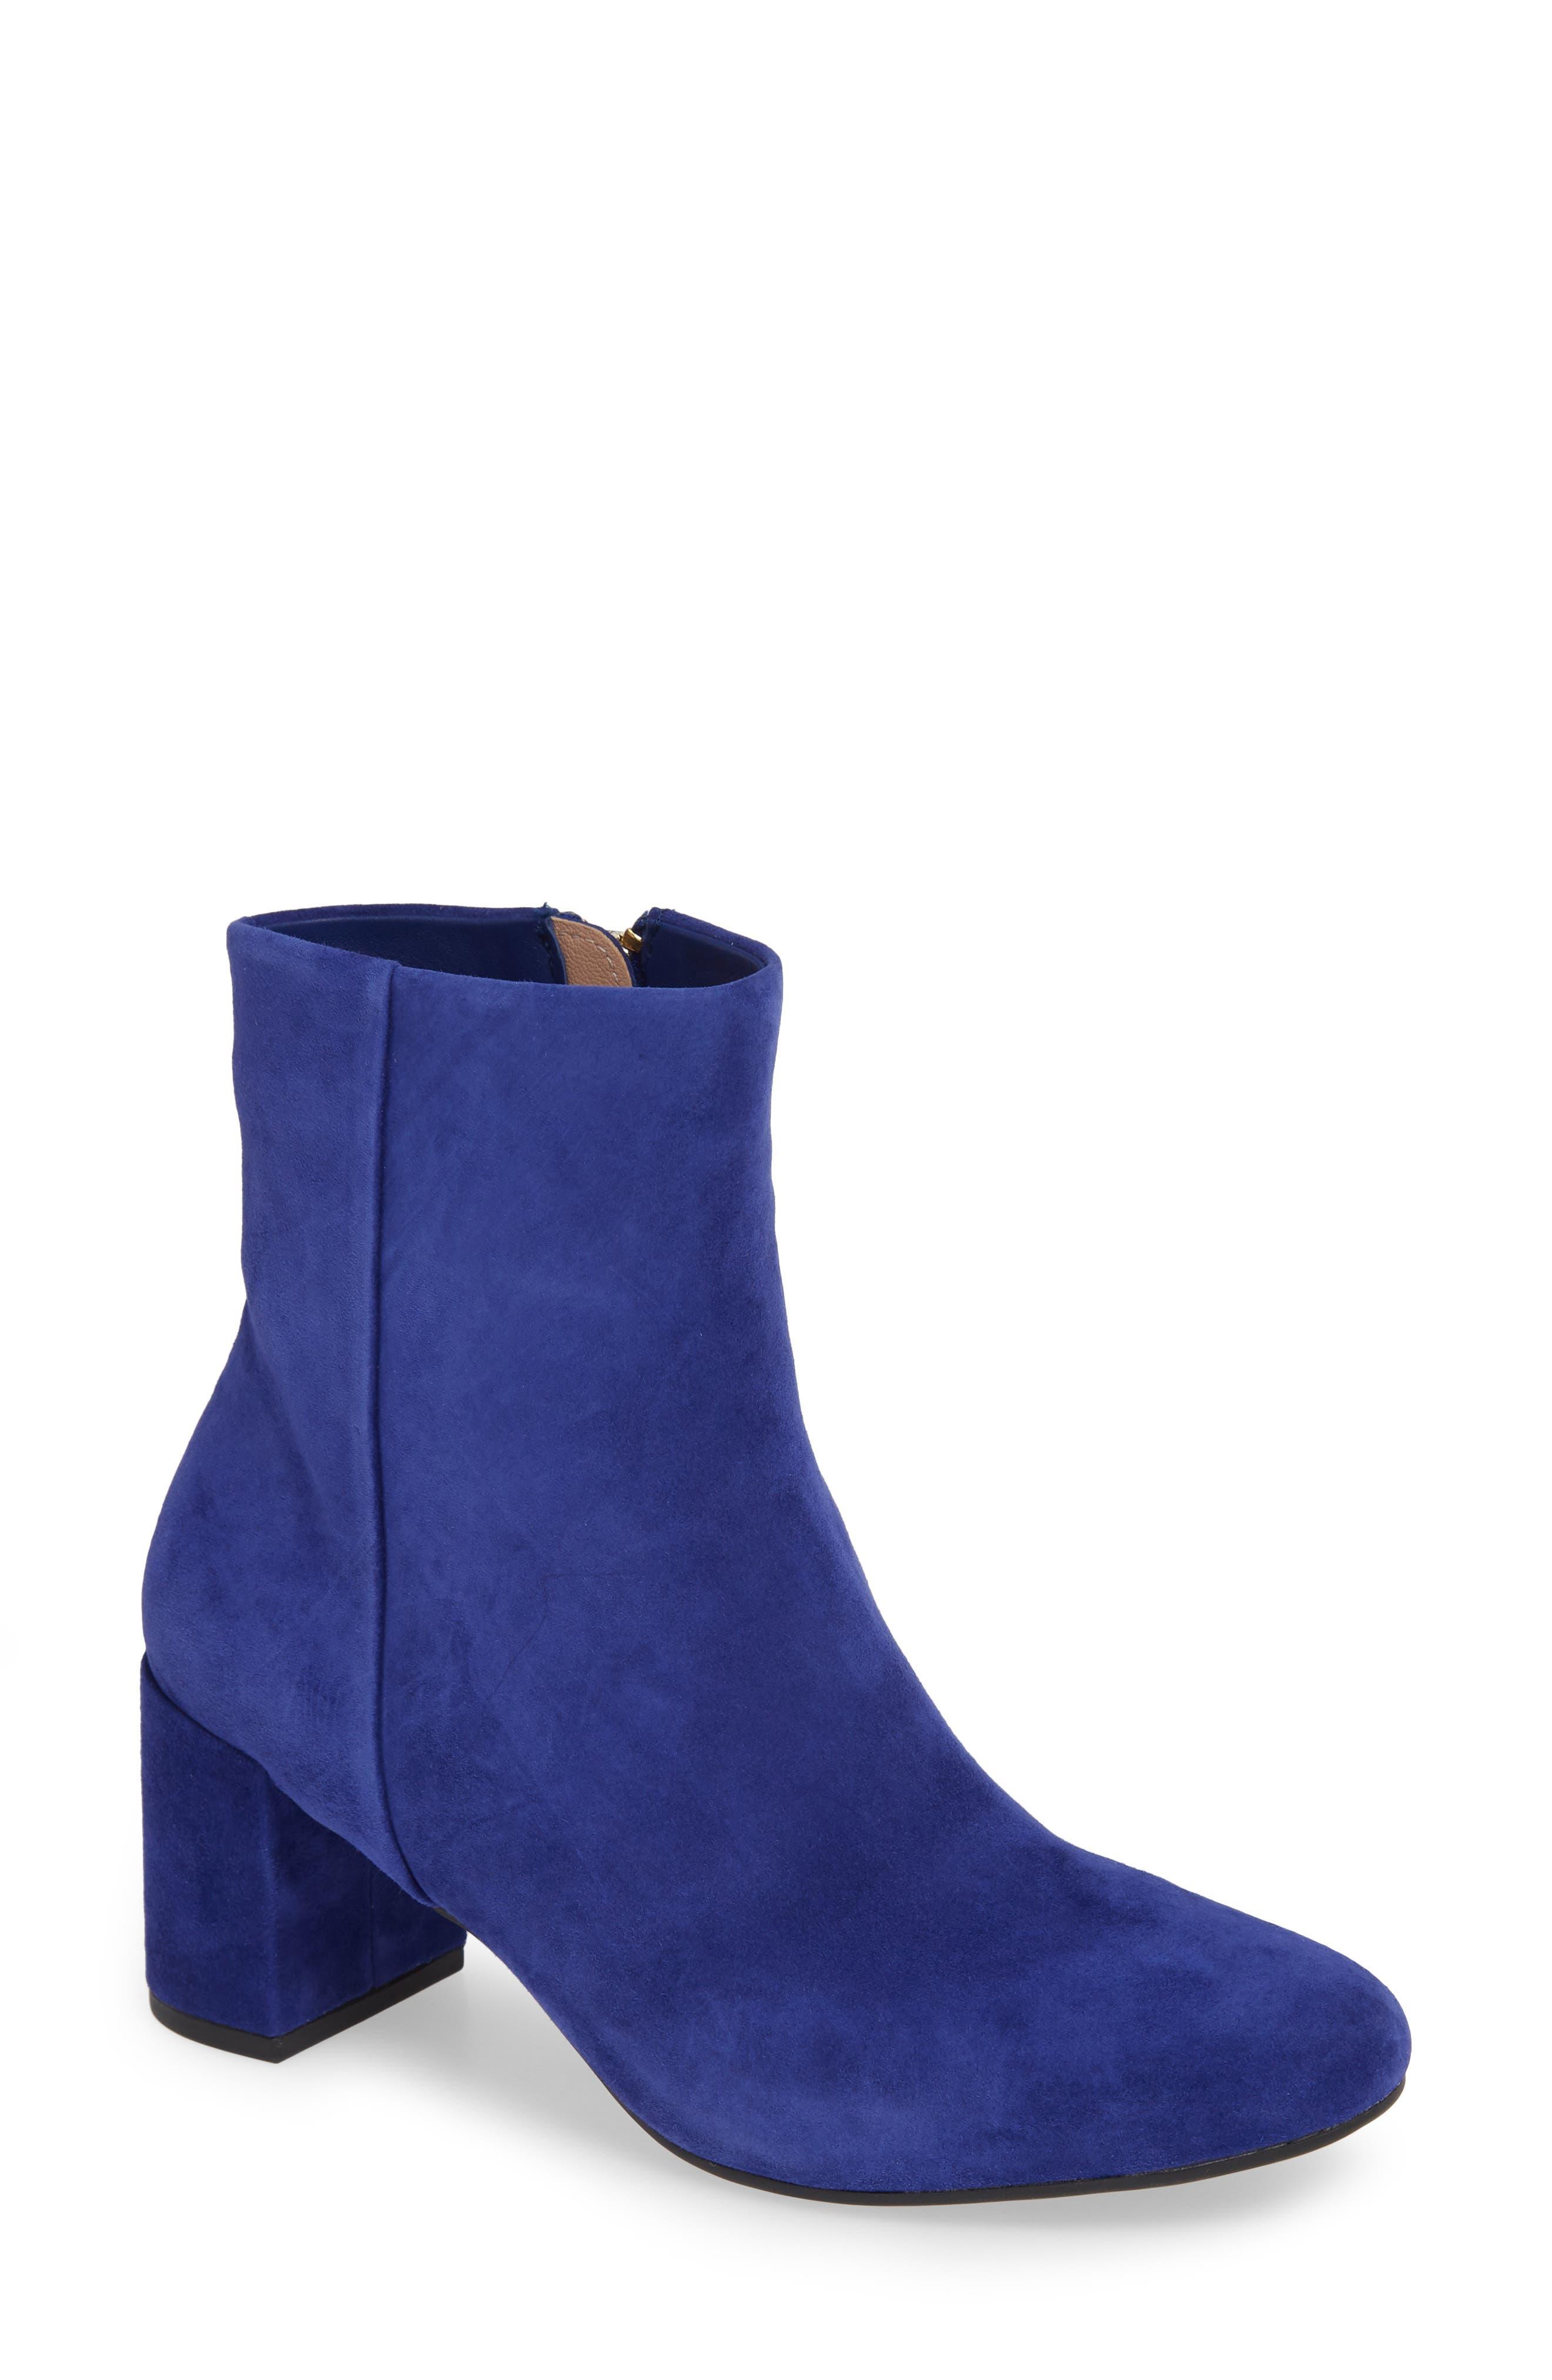 Taryn Rose Cassidy Block Heel Bootie, Blue